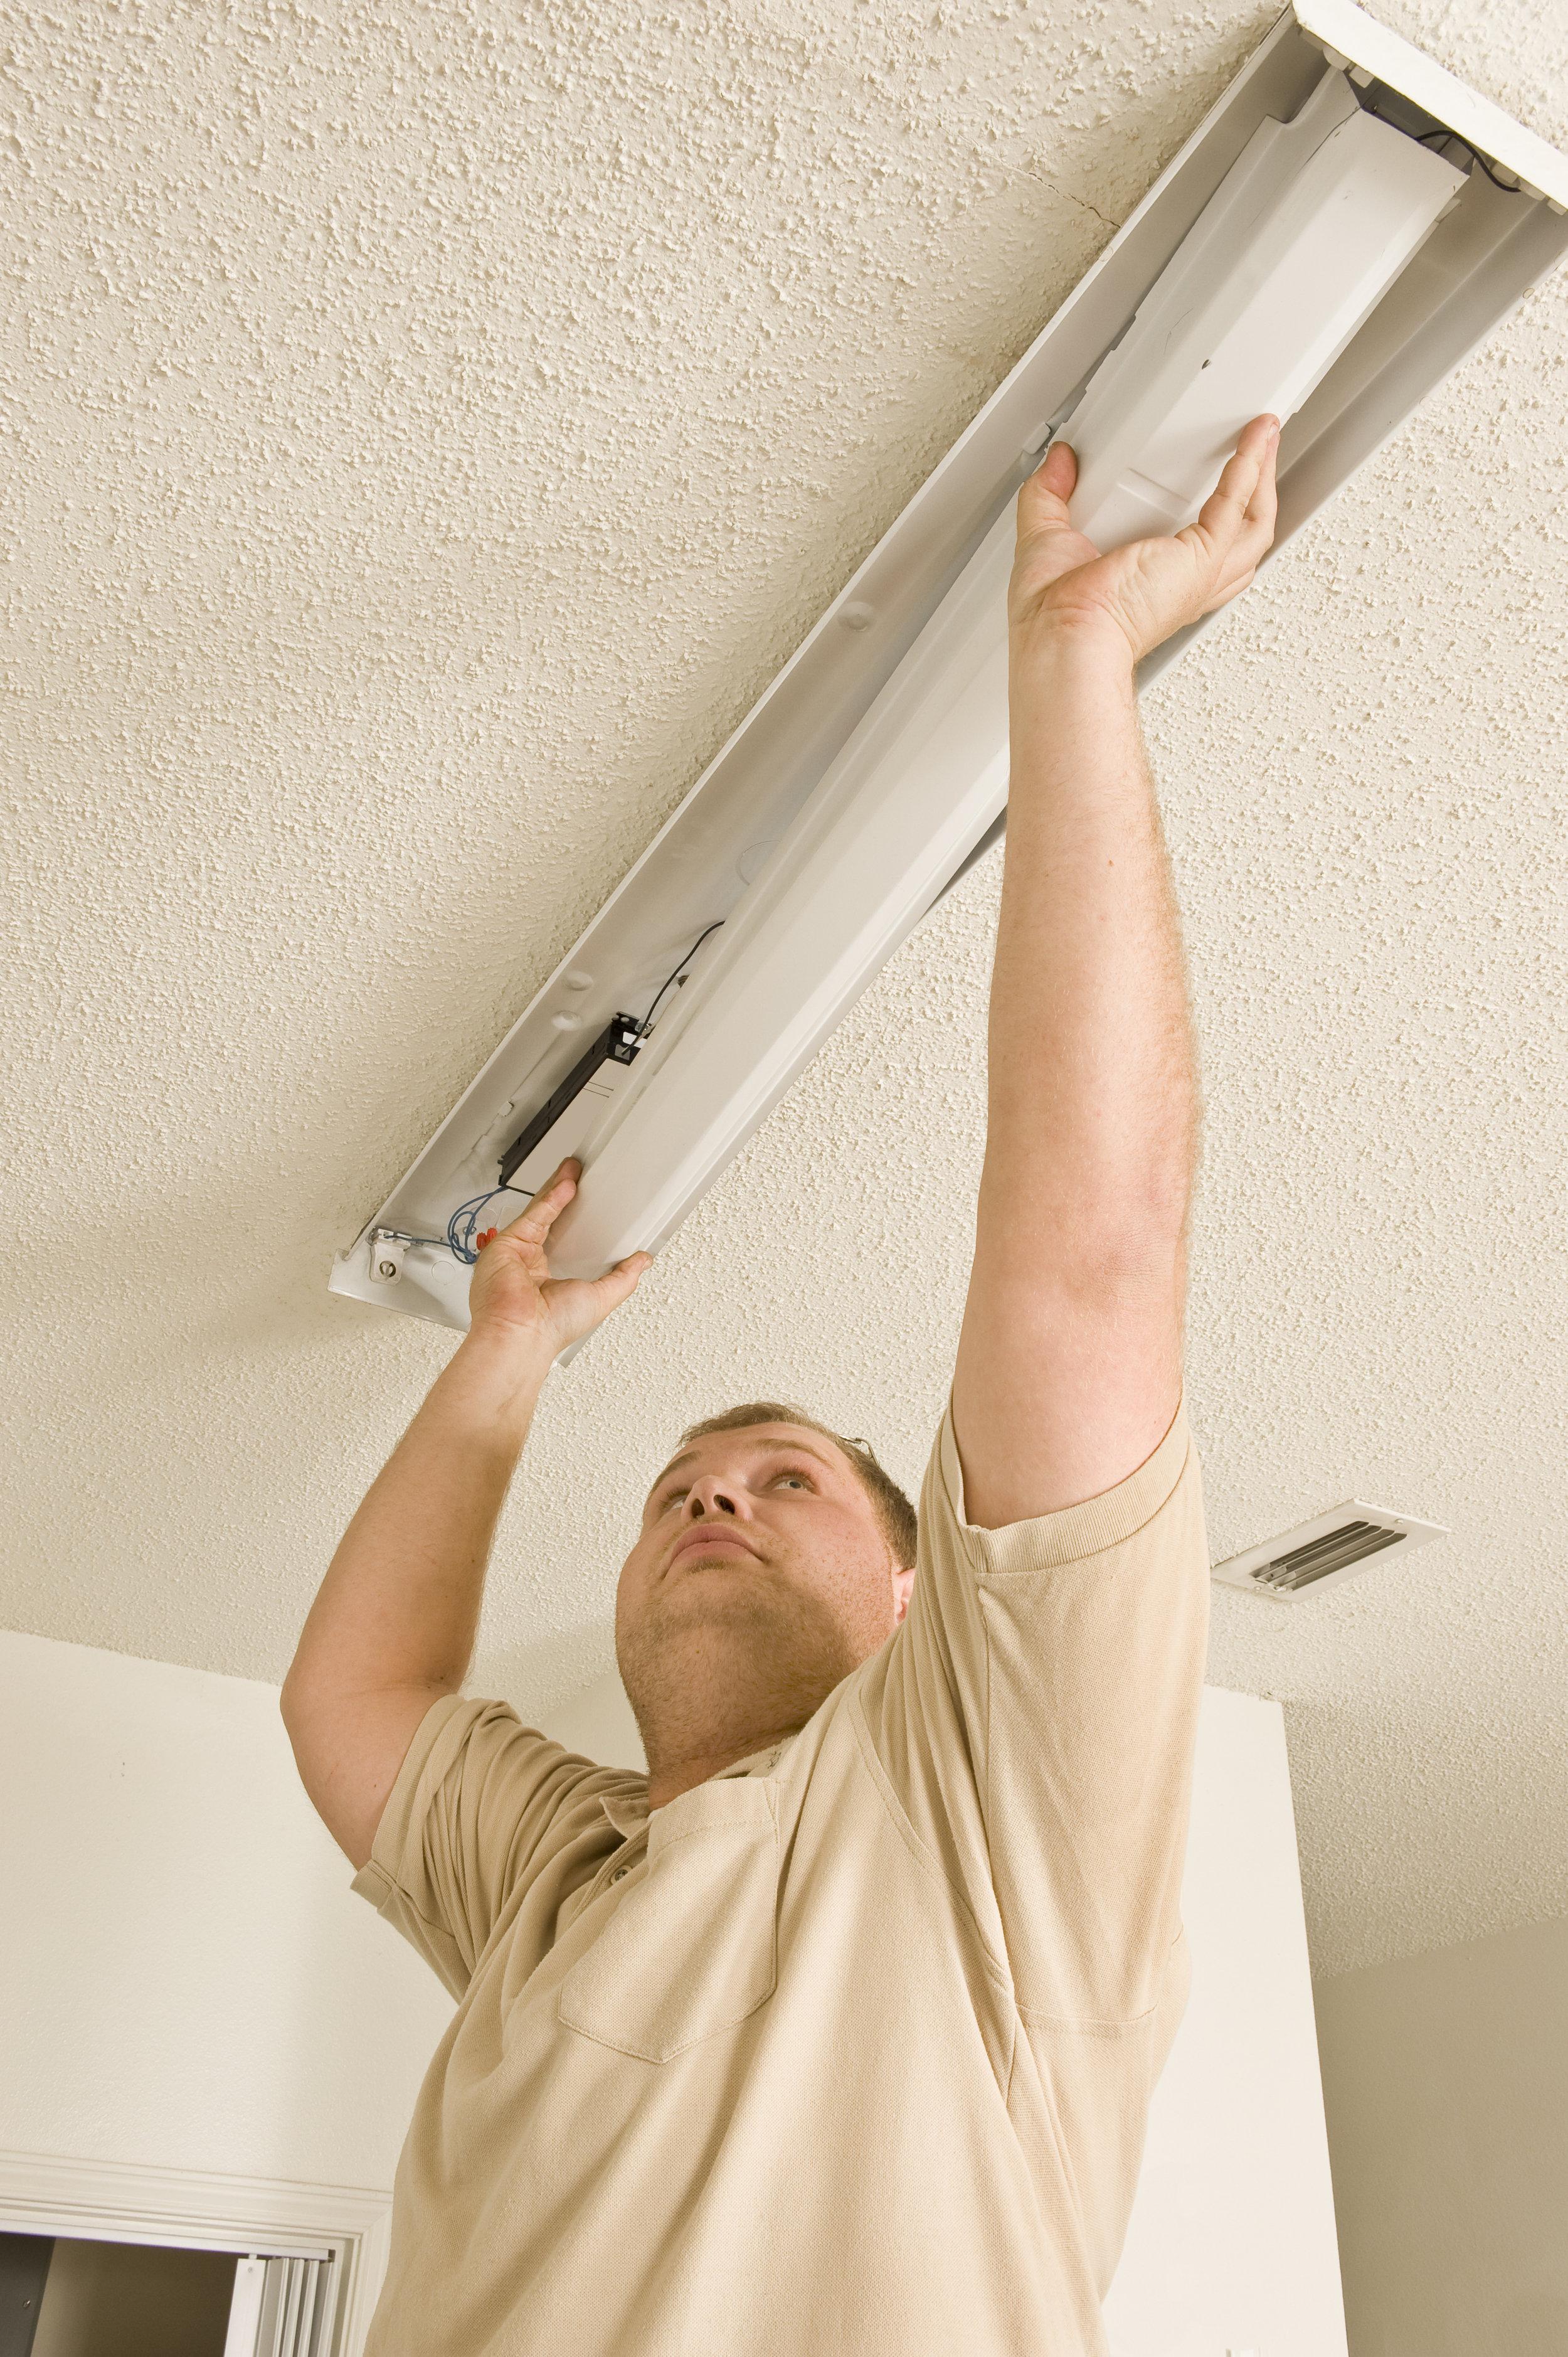 electrician-installing-flourescent-lighting_BYMuhT6Vs.jpg